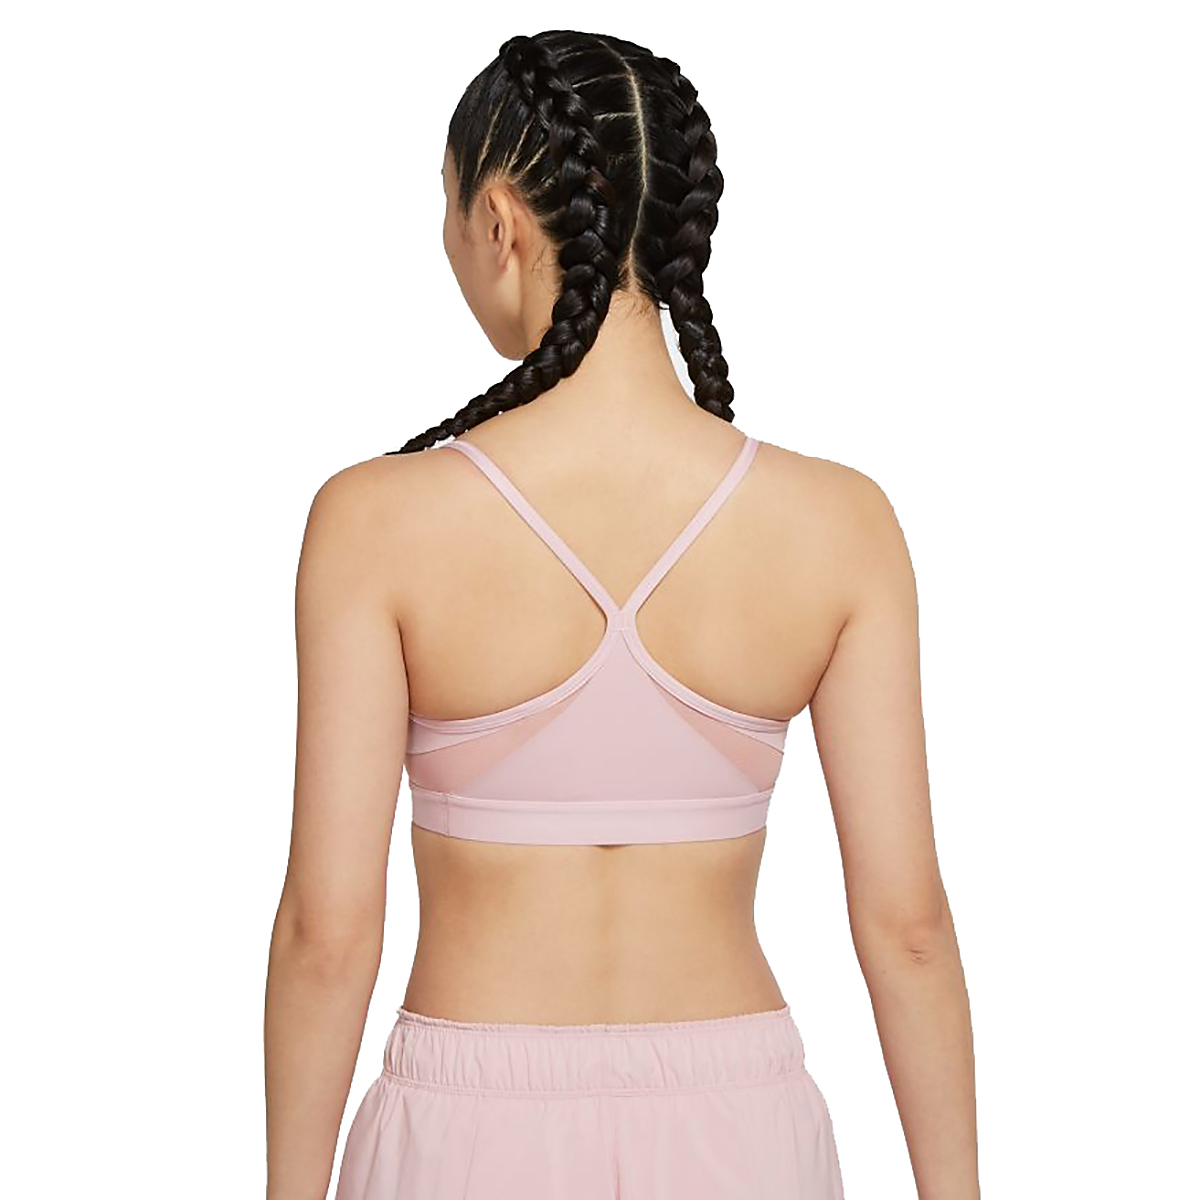 Women's Nike Dri-FIT Indy Light-Support Padded U-Neck Sports Bra - Color: Pink Glaze/Rust Pink/White - Size: XS, Pink Glaze/Rust Pink/White, large, image 2